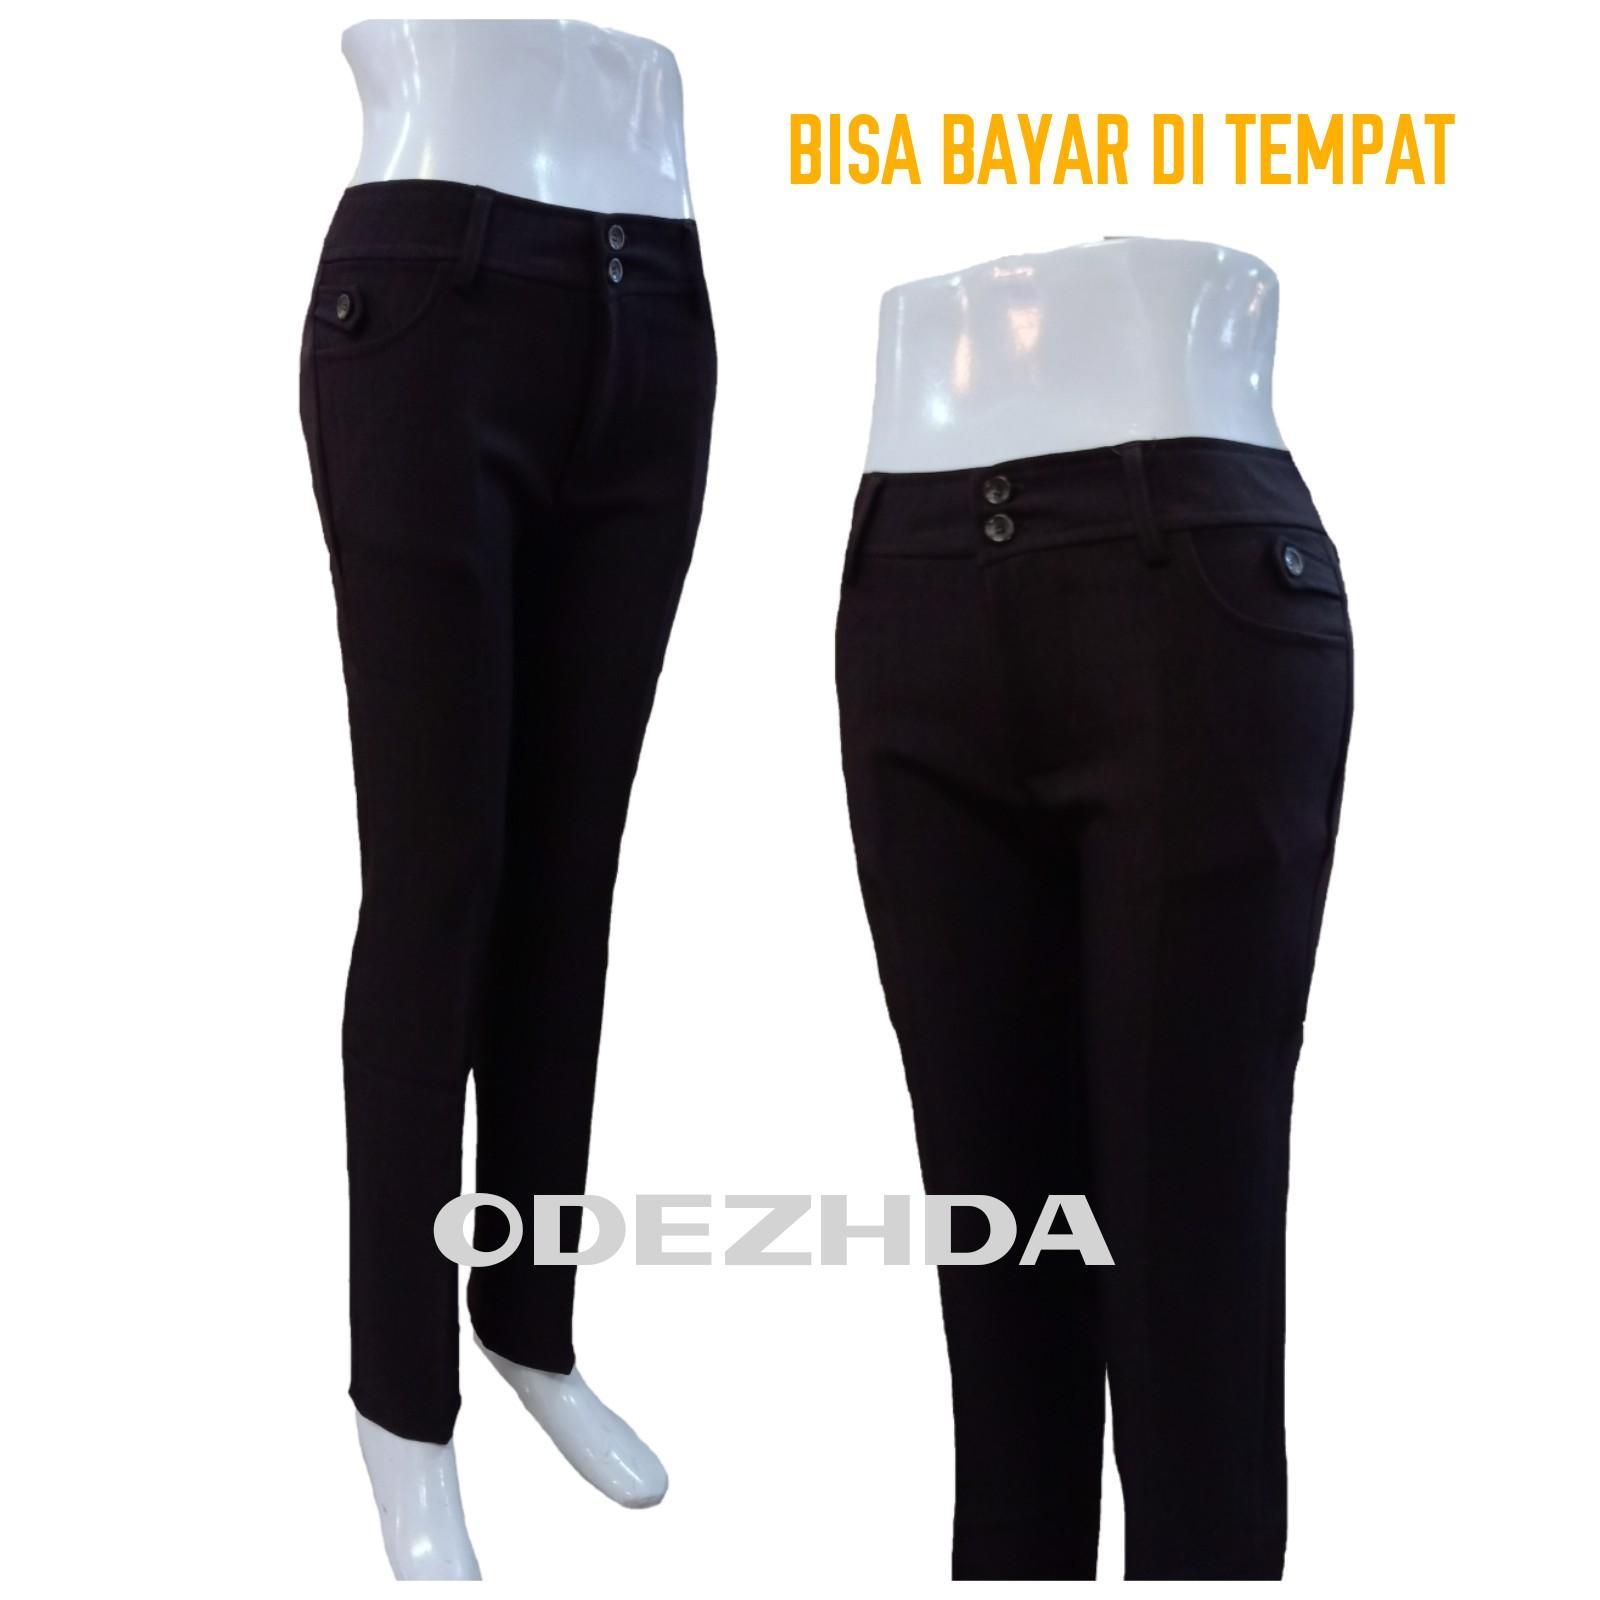 BUSANA INDONESIA celana kantor wanita/celana kerja wanita/celana bahan wanita/celana panjang wanita/celana casual wanita/celana chino wanita